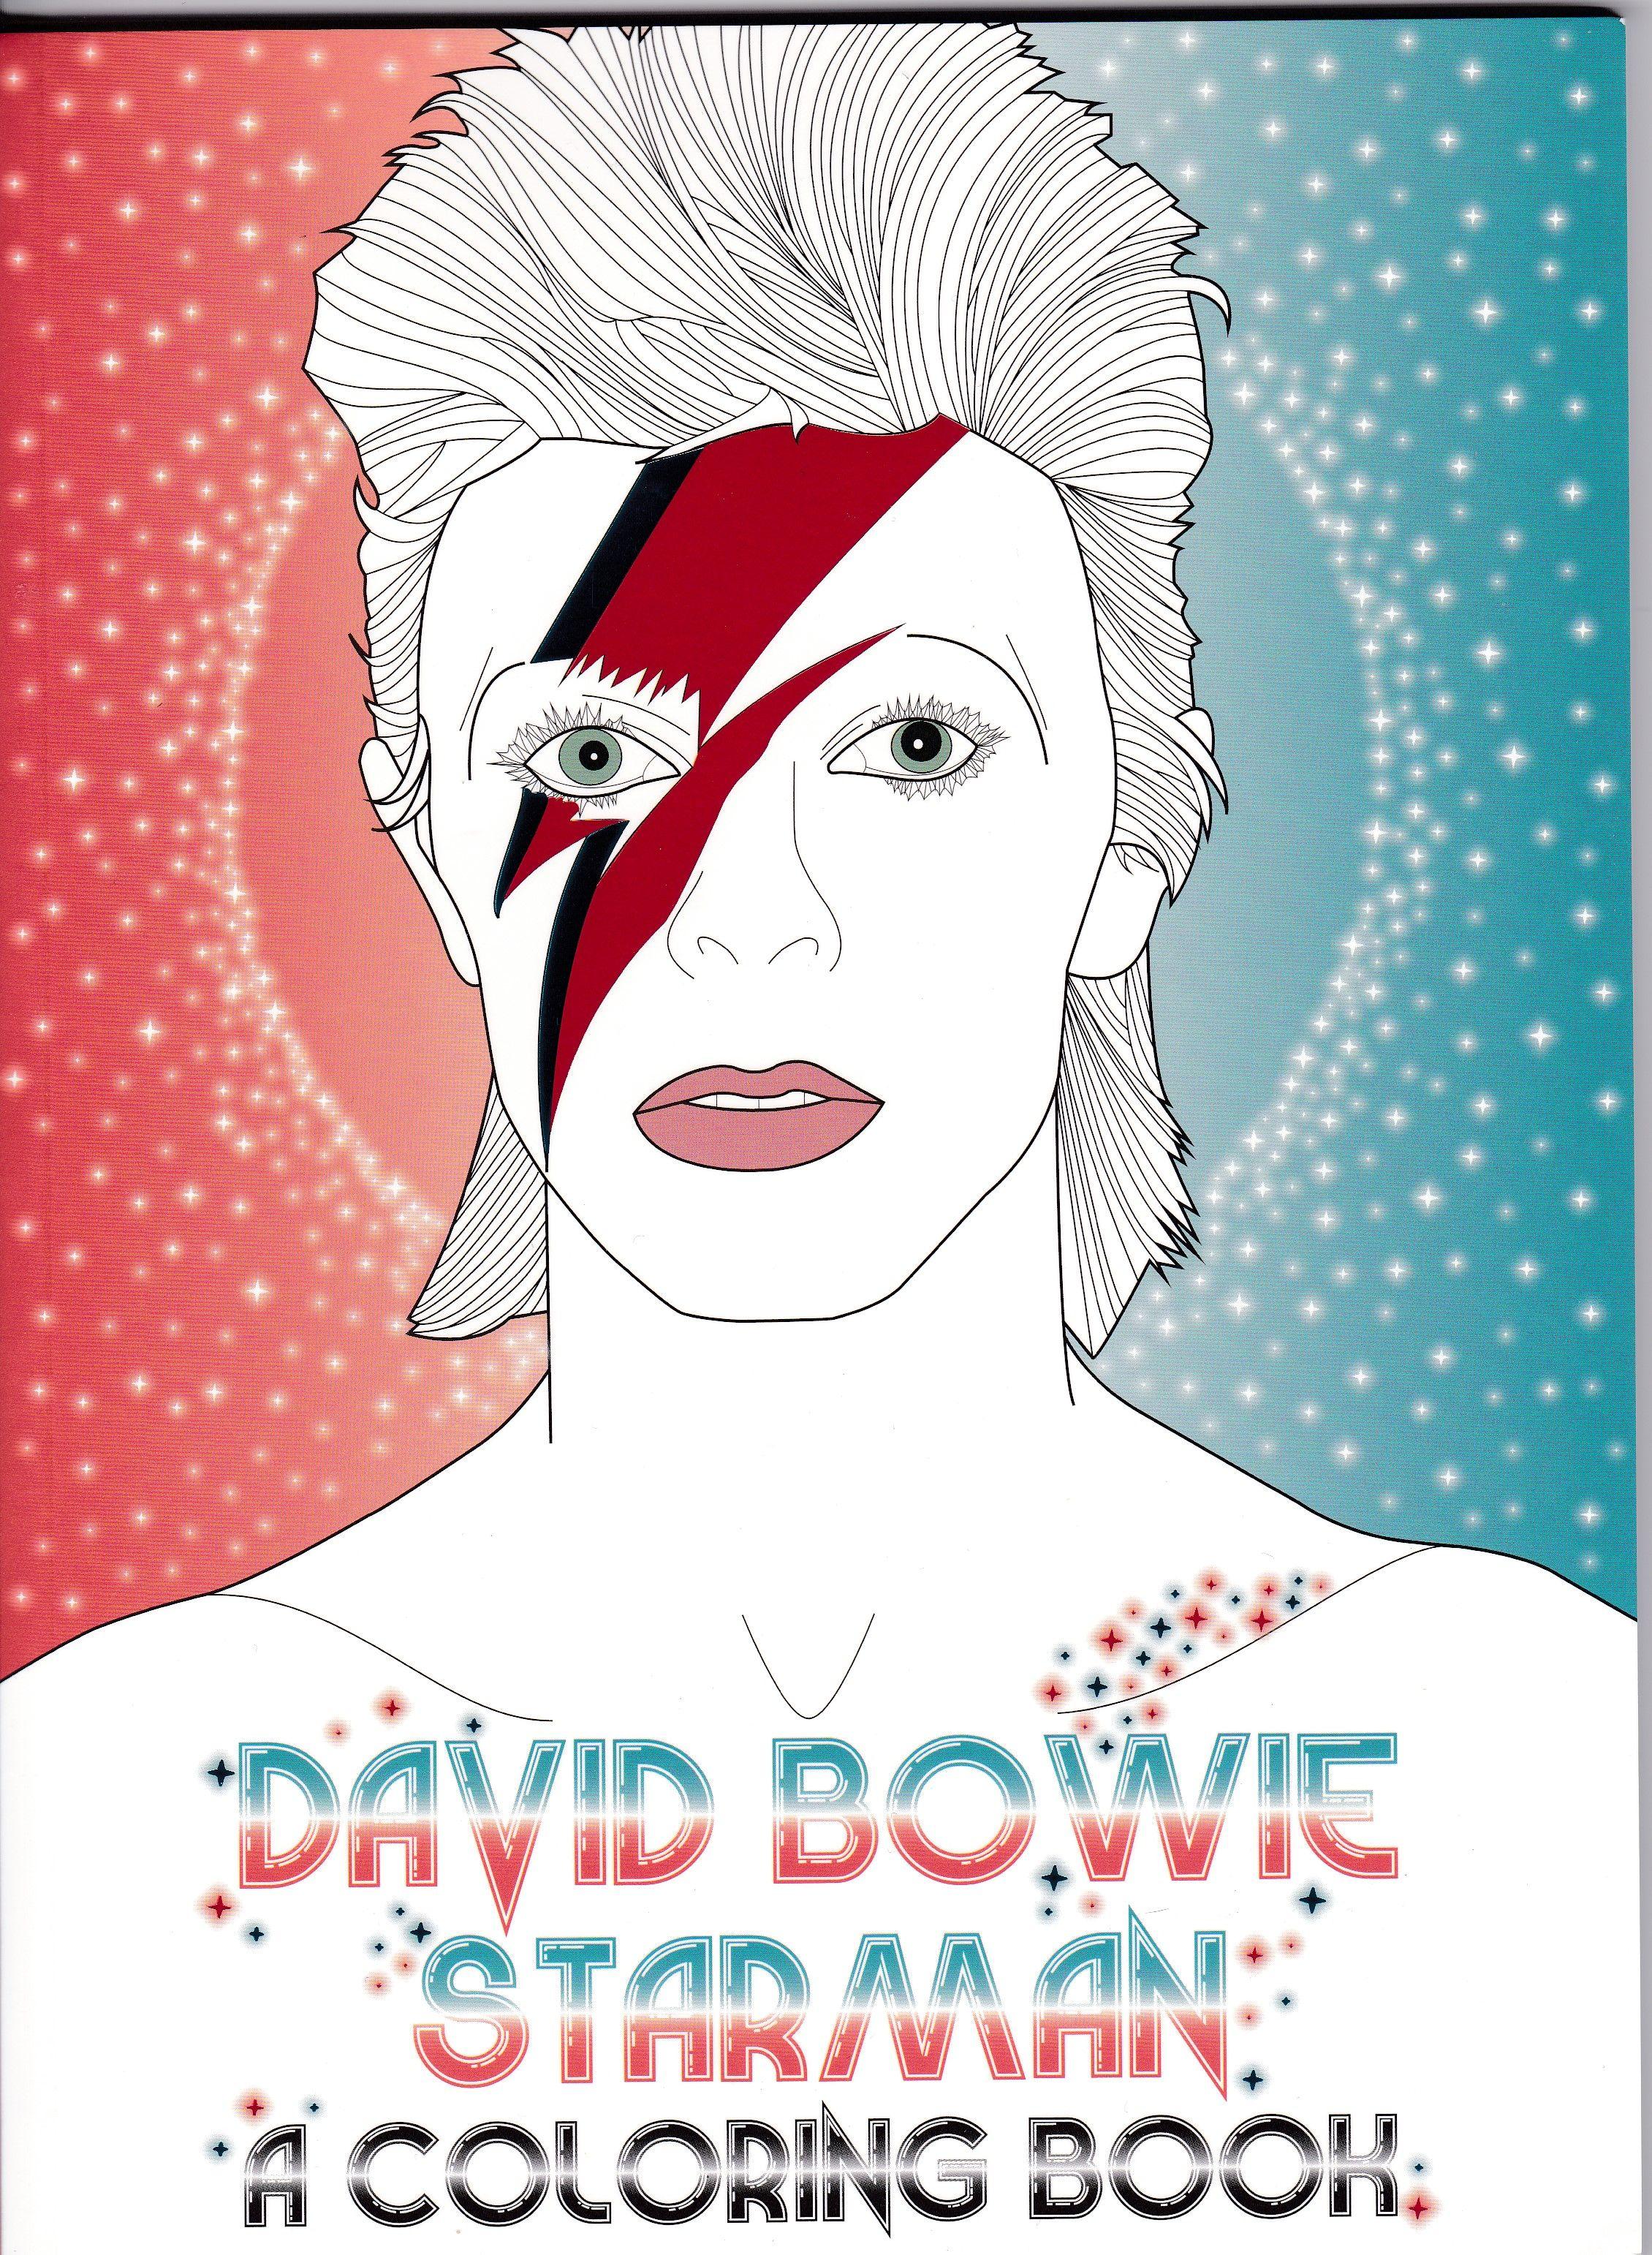 David Bowie Starman Coloring Book - Mandalas